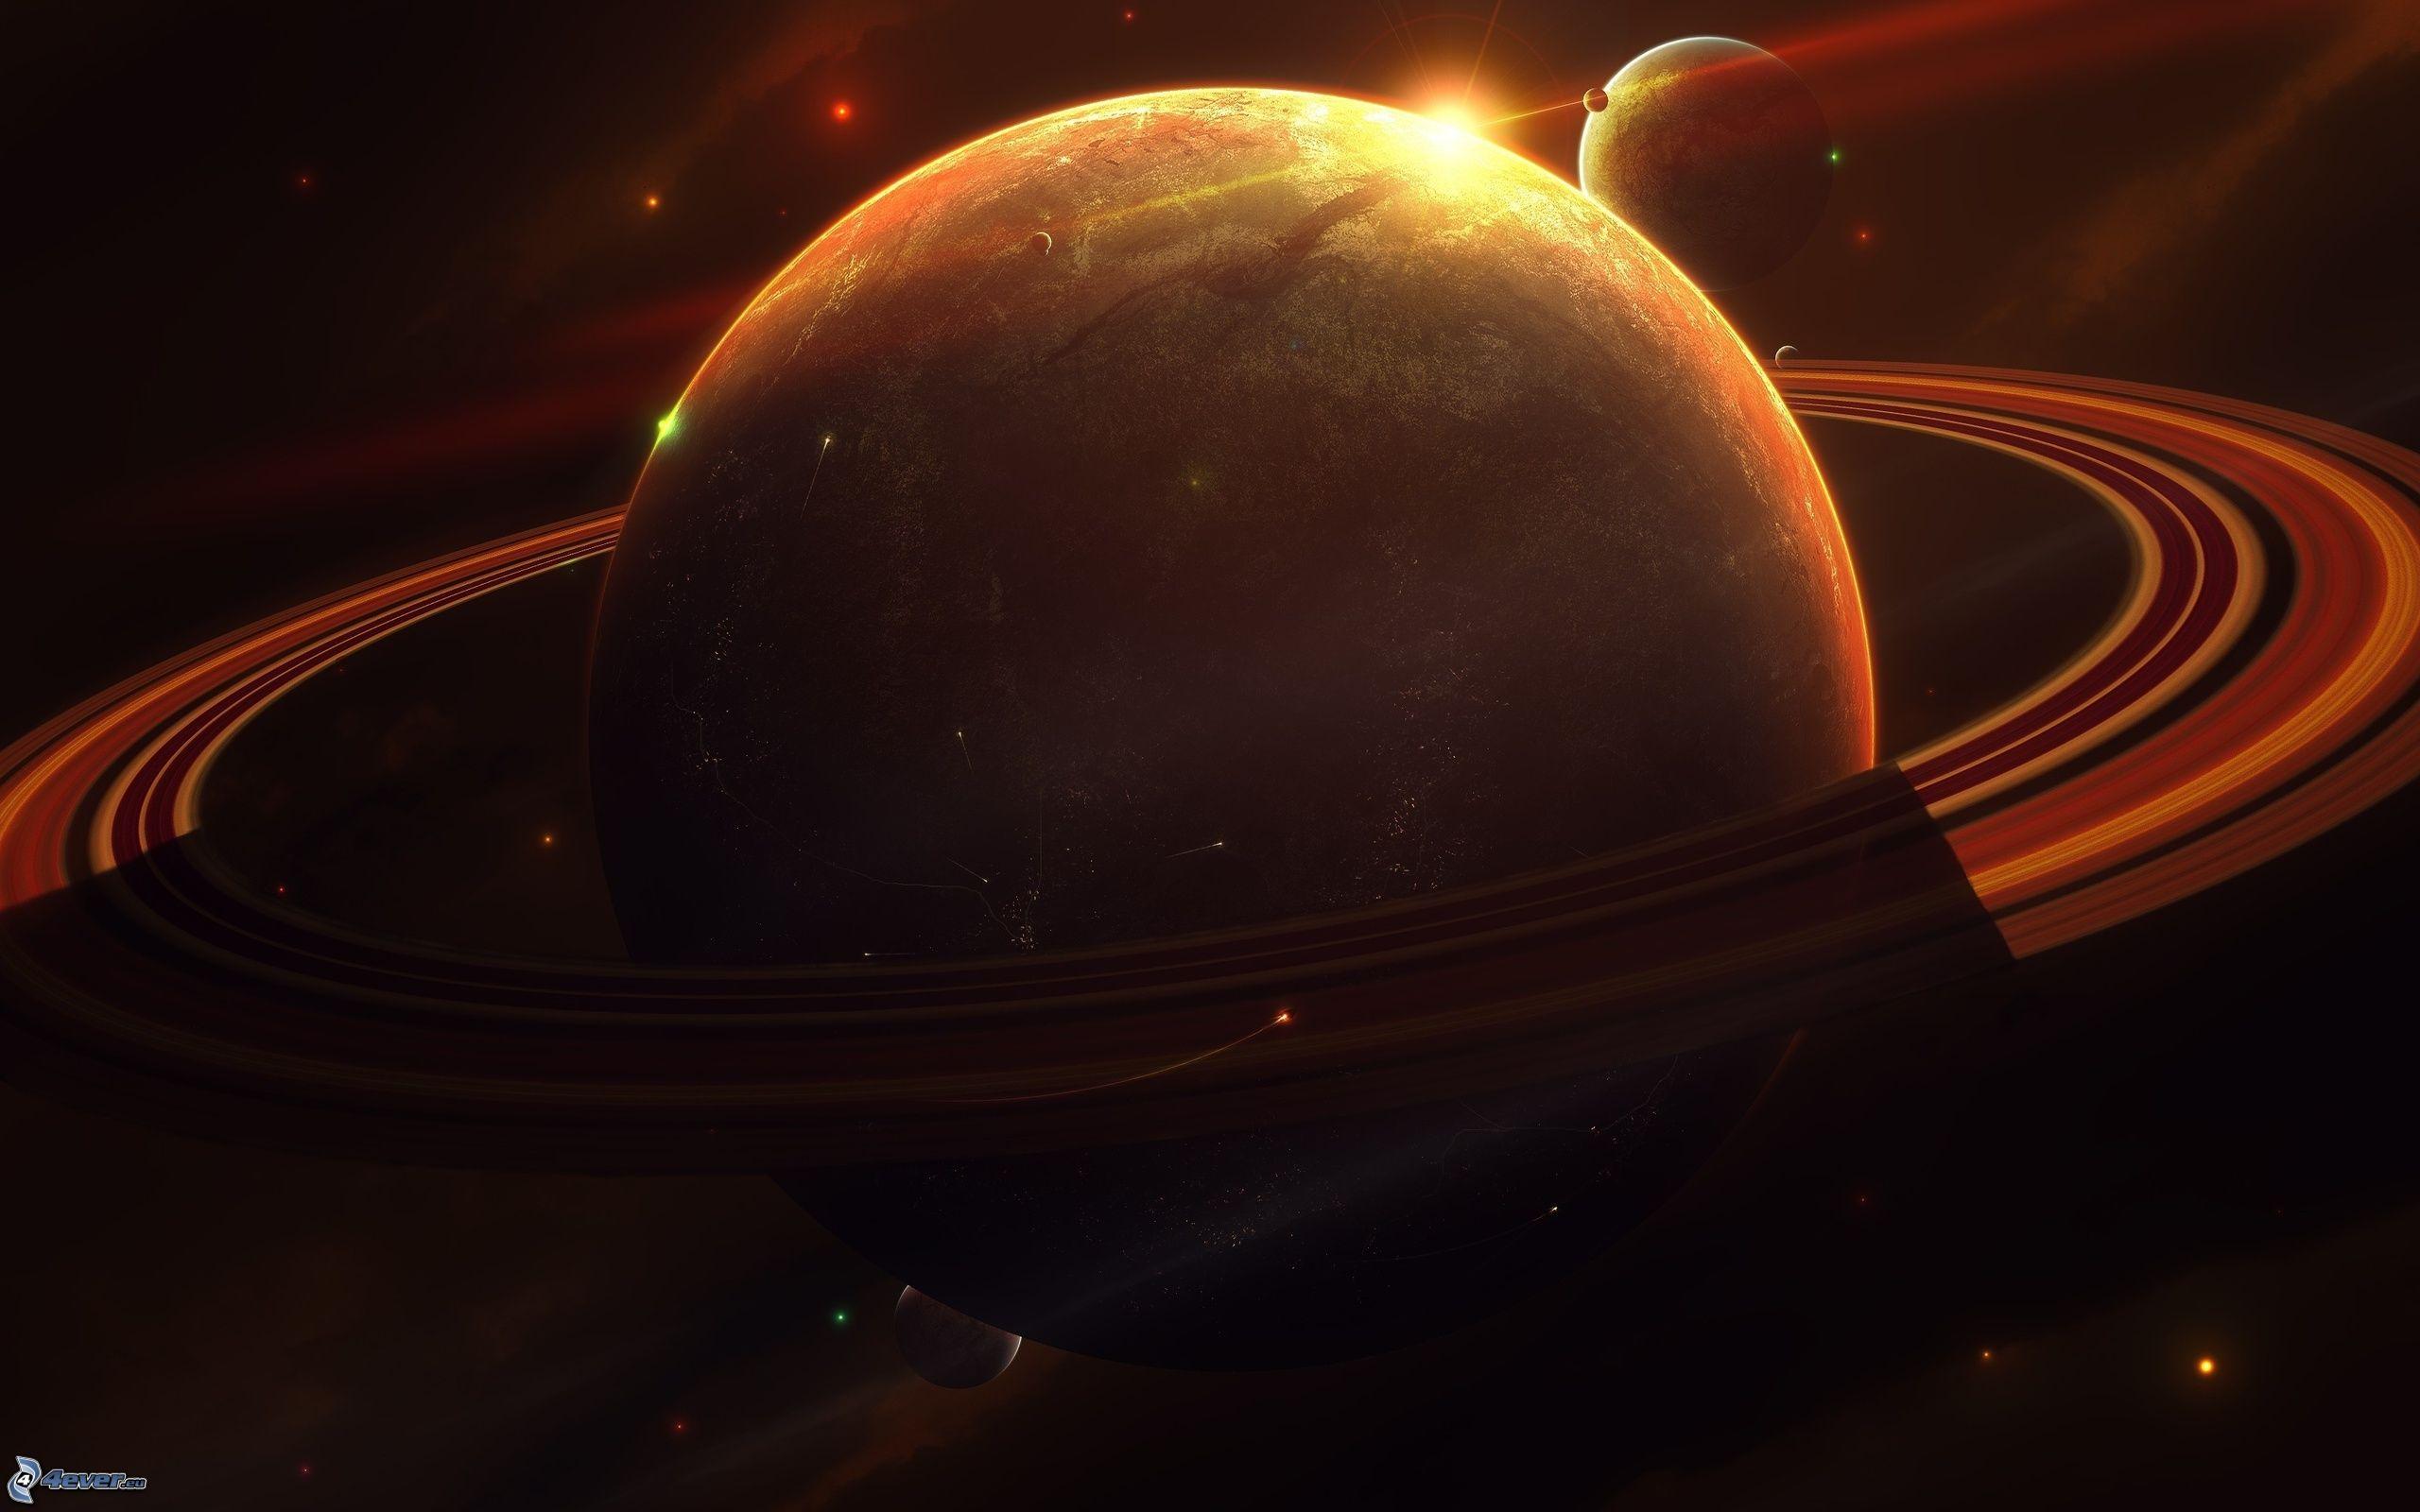 saturn-planet-sonne-sterne-159728